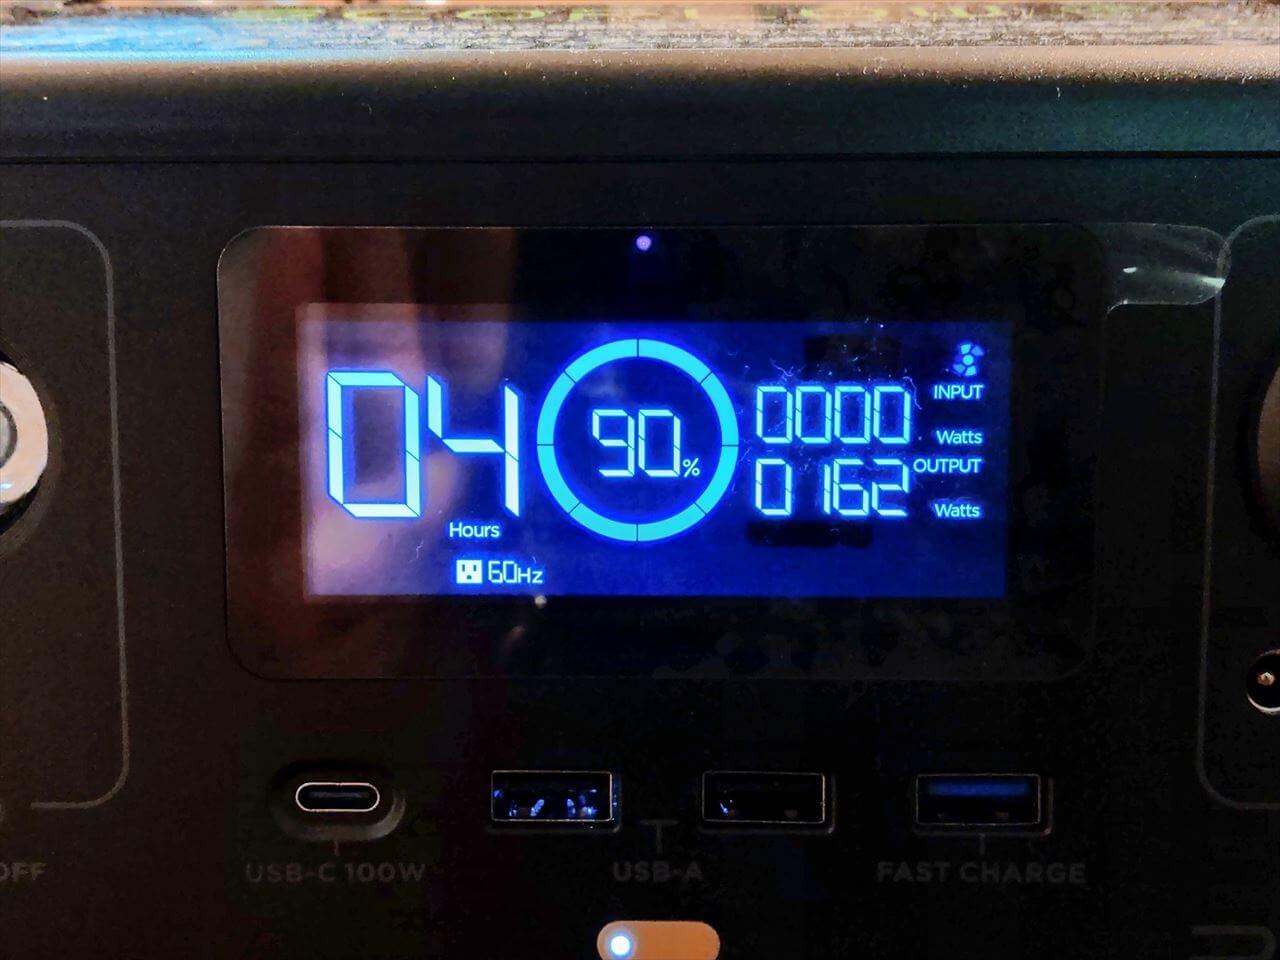 EcoFlow RIVER Pro ポータブル電源にプロジェクターを接続した時の消費電力